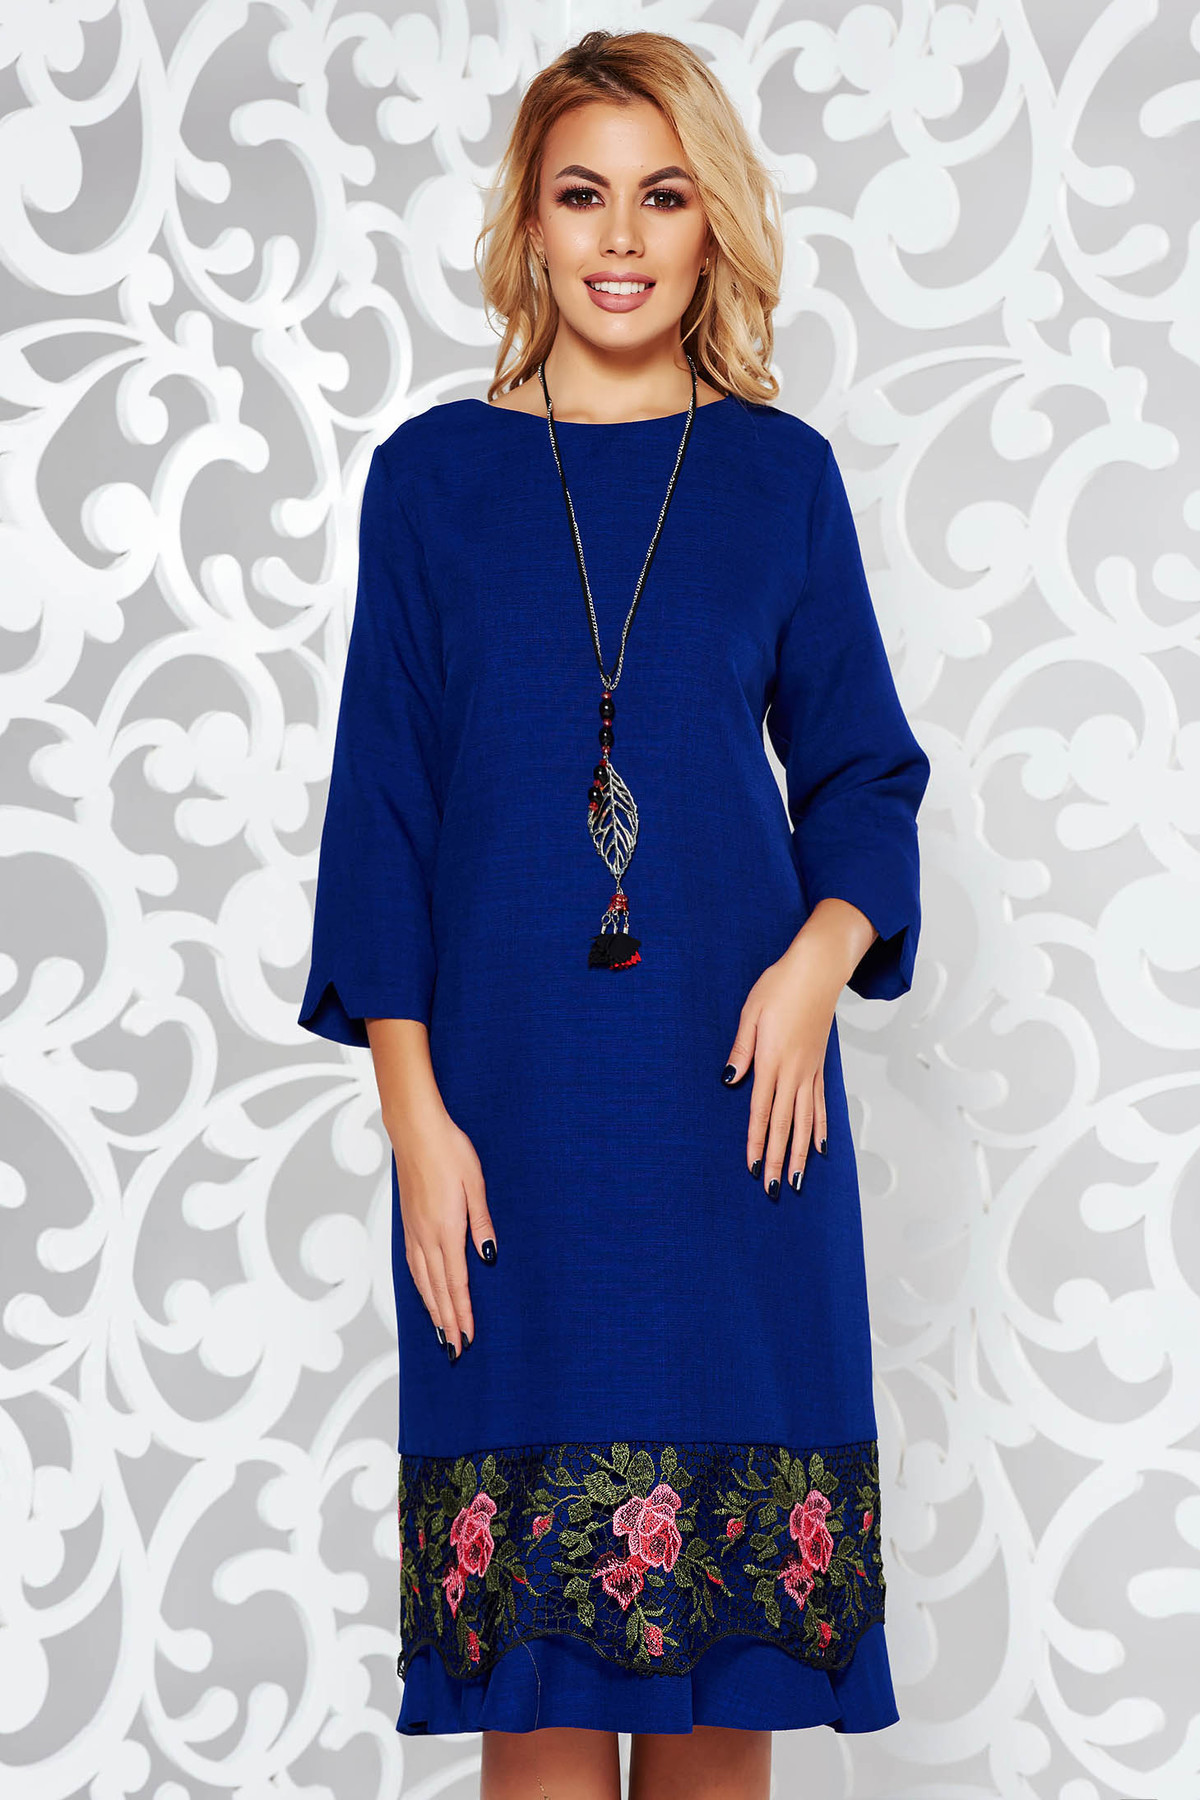 Rochie albastra eleganta cu croi larg din stofa usor elastica cu aplicatii de dantela accesorizata cu lantisor